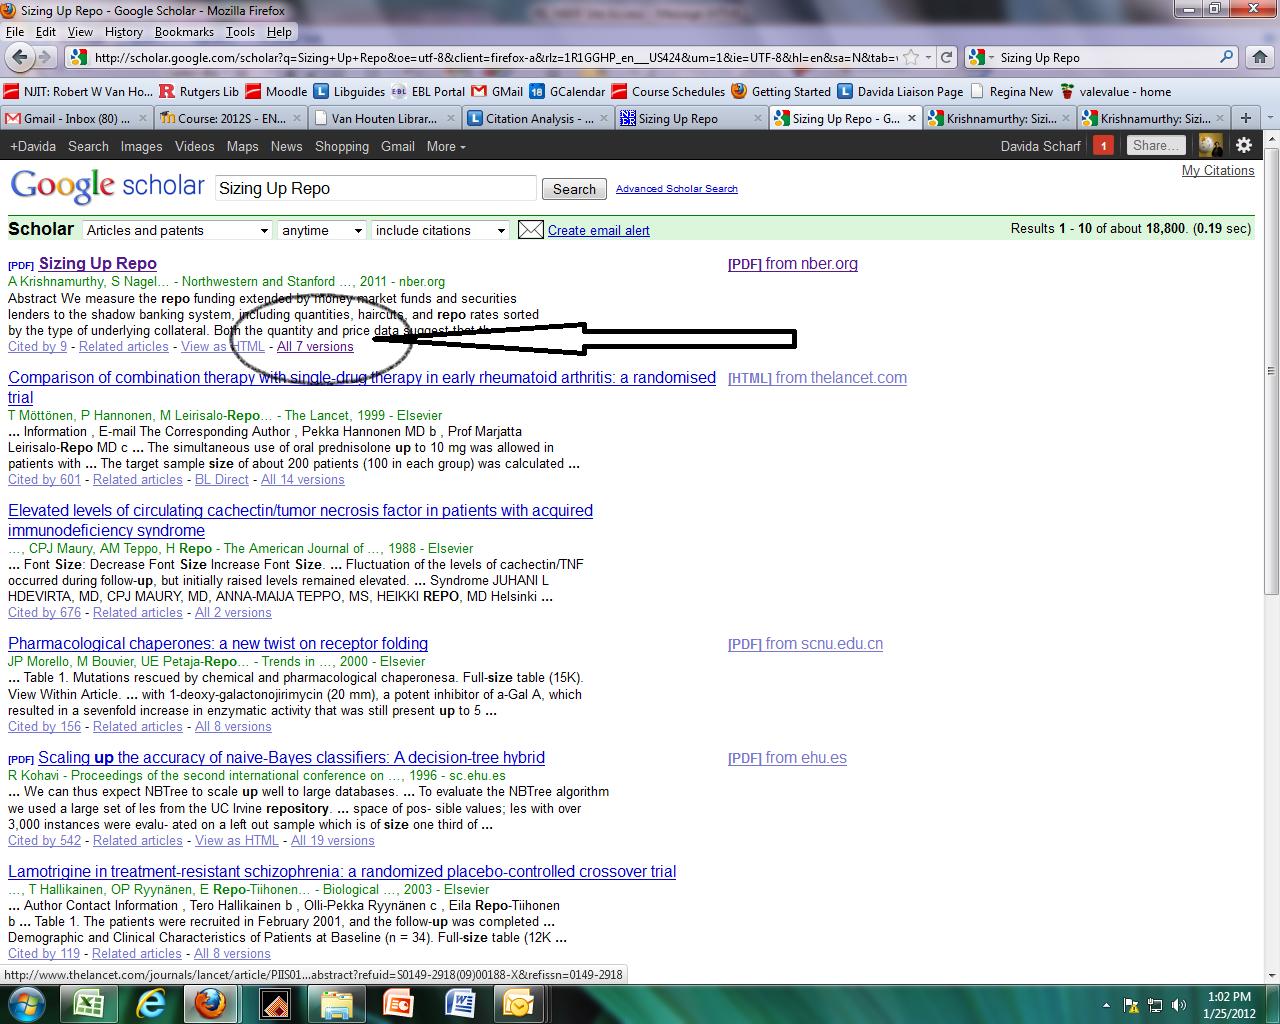 Google Scholar Screen Shot